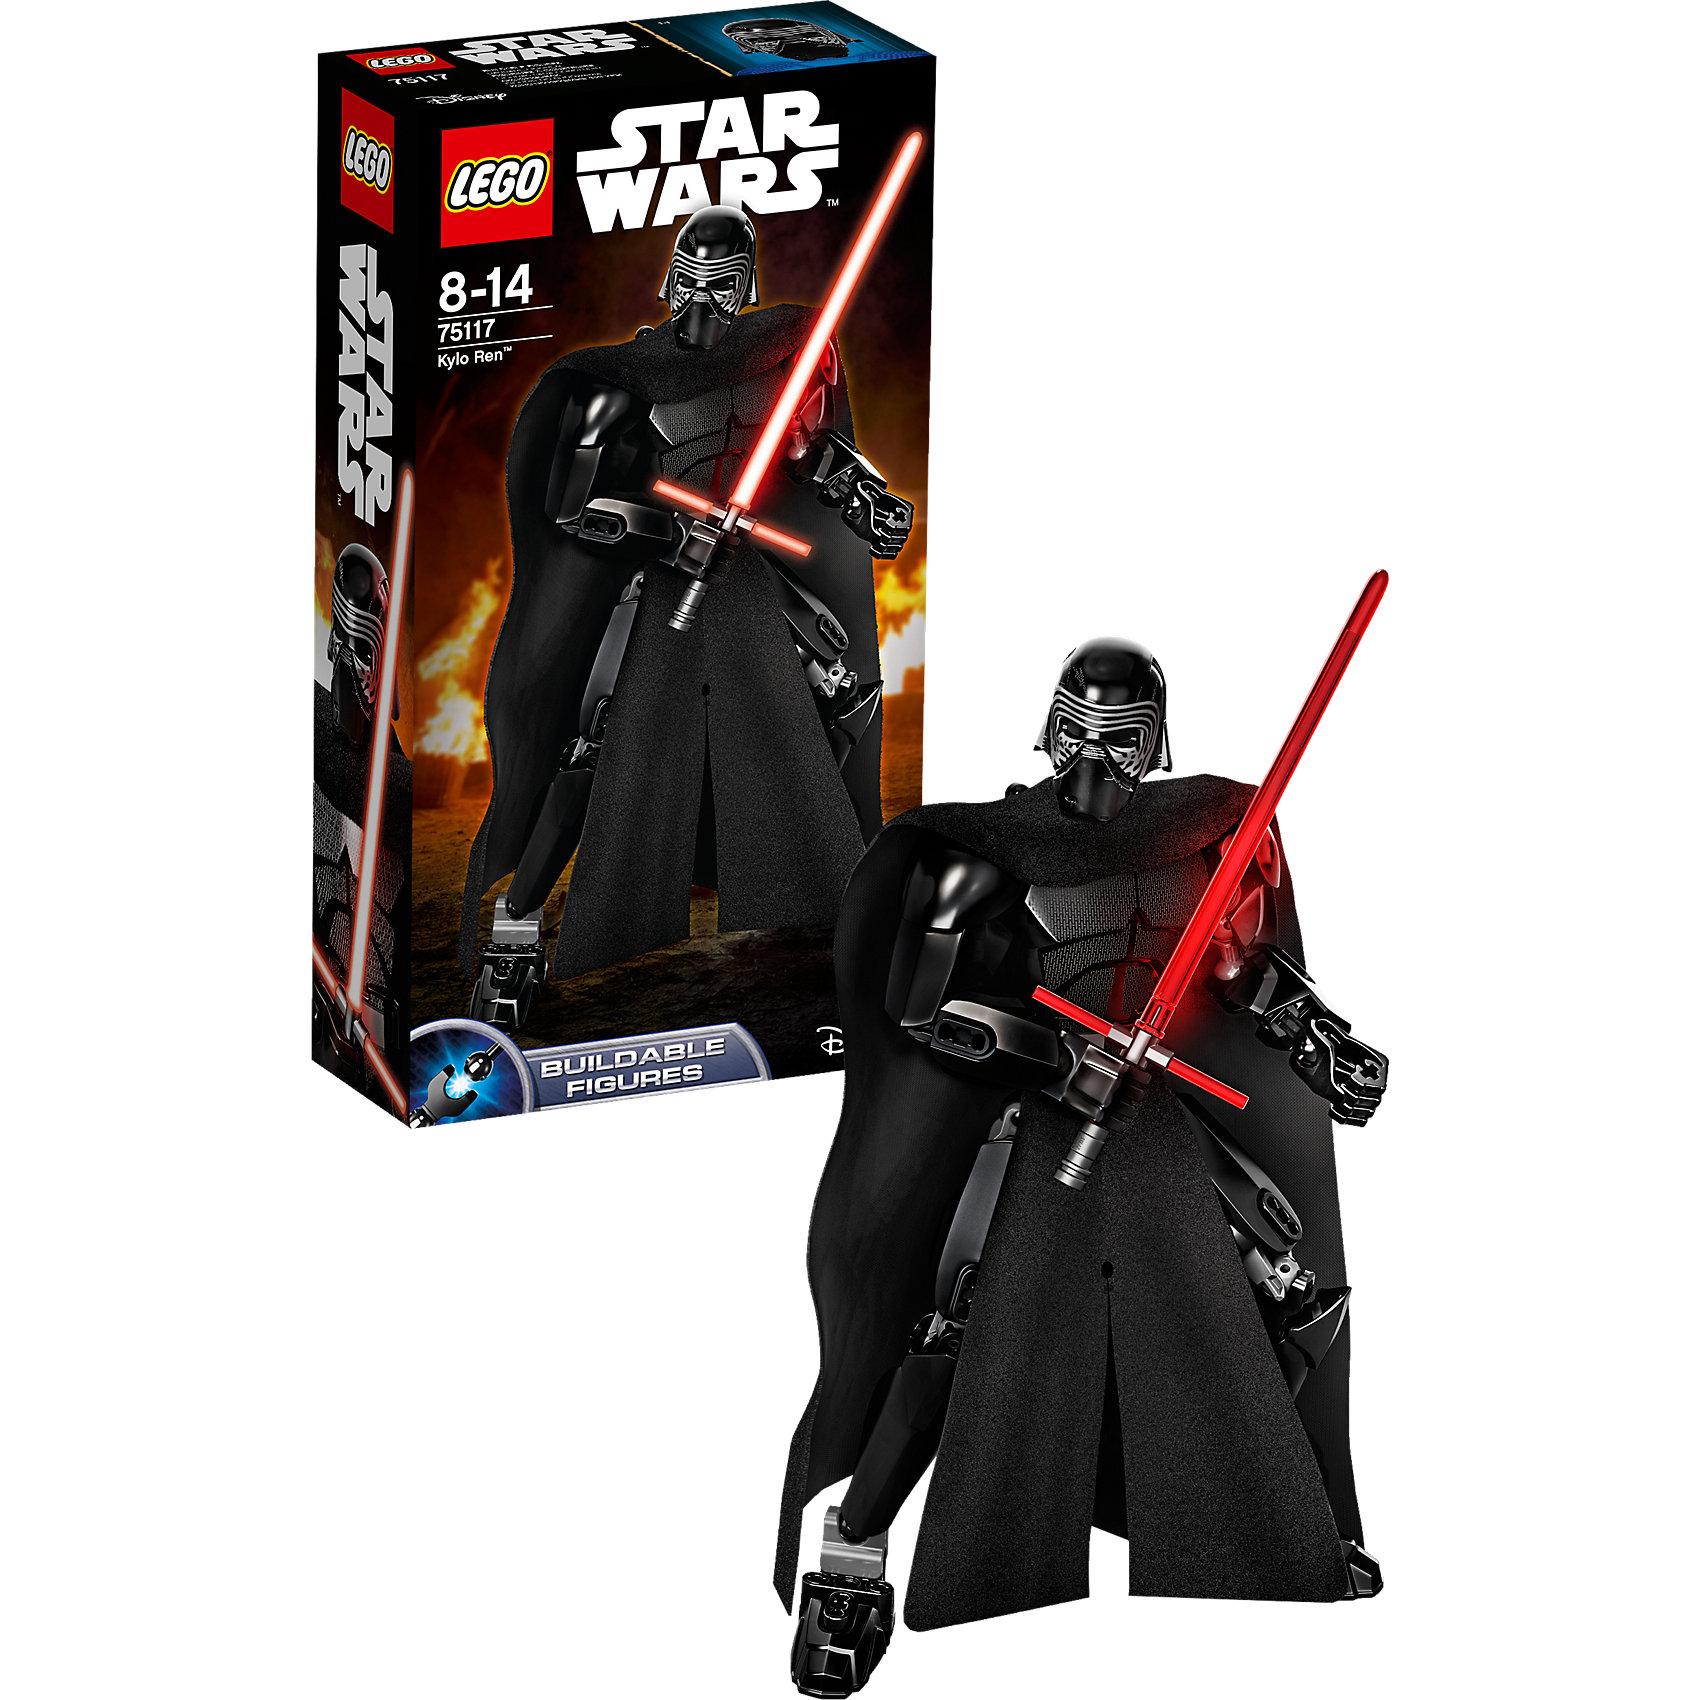 LEGO LEGO Star Wars 75117: Кайло Рен star wars 75104 командный шаттл кайло рена